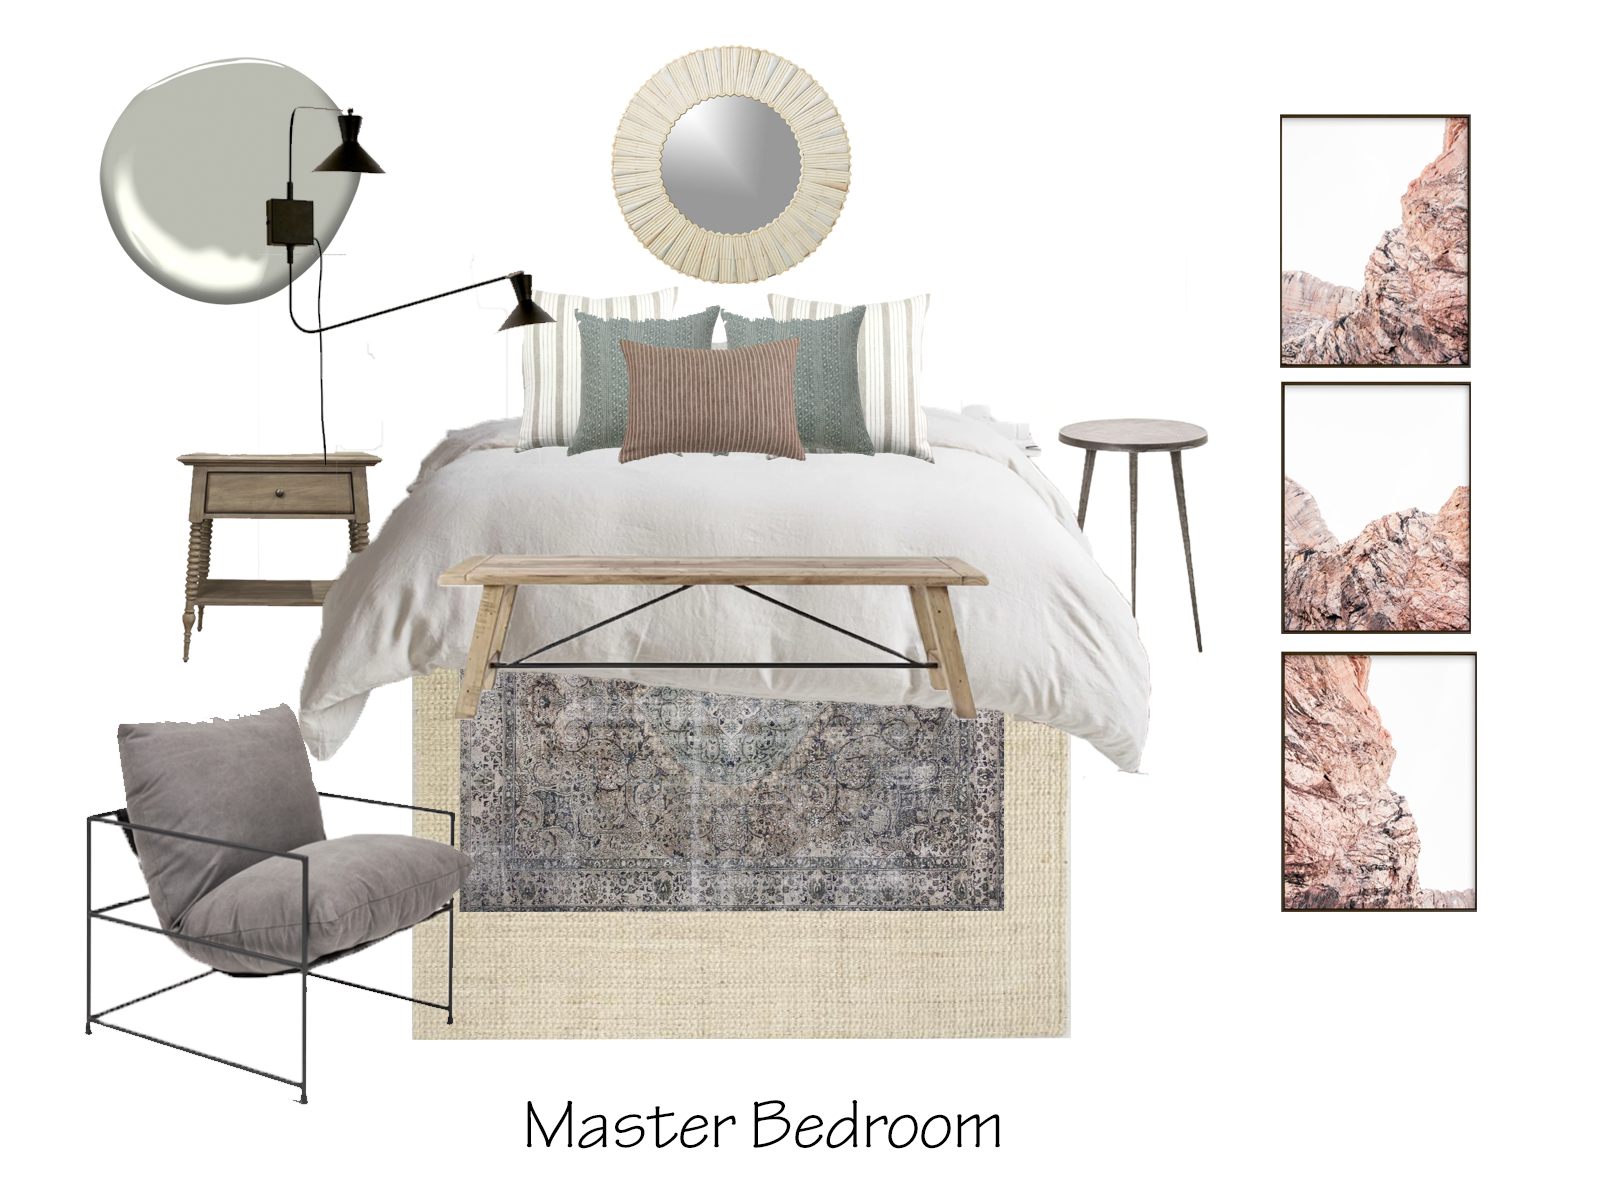 Eclectic Master Bedroom Design Eclecticdesign Eclecticinteriors Eclecticbedroom Bedroomdesign Masterbedroomdesign Master Bedroom Design Interior Design Eclectic Design